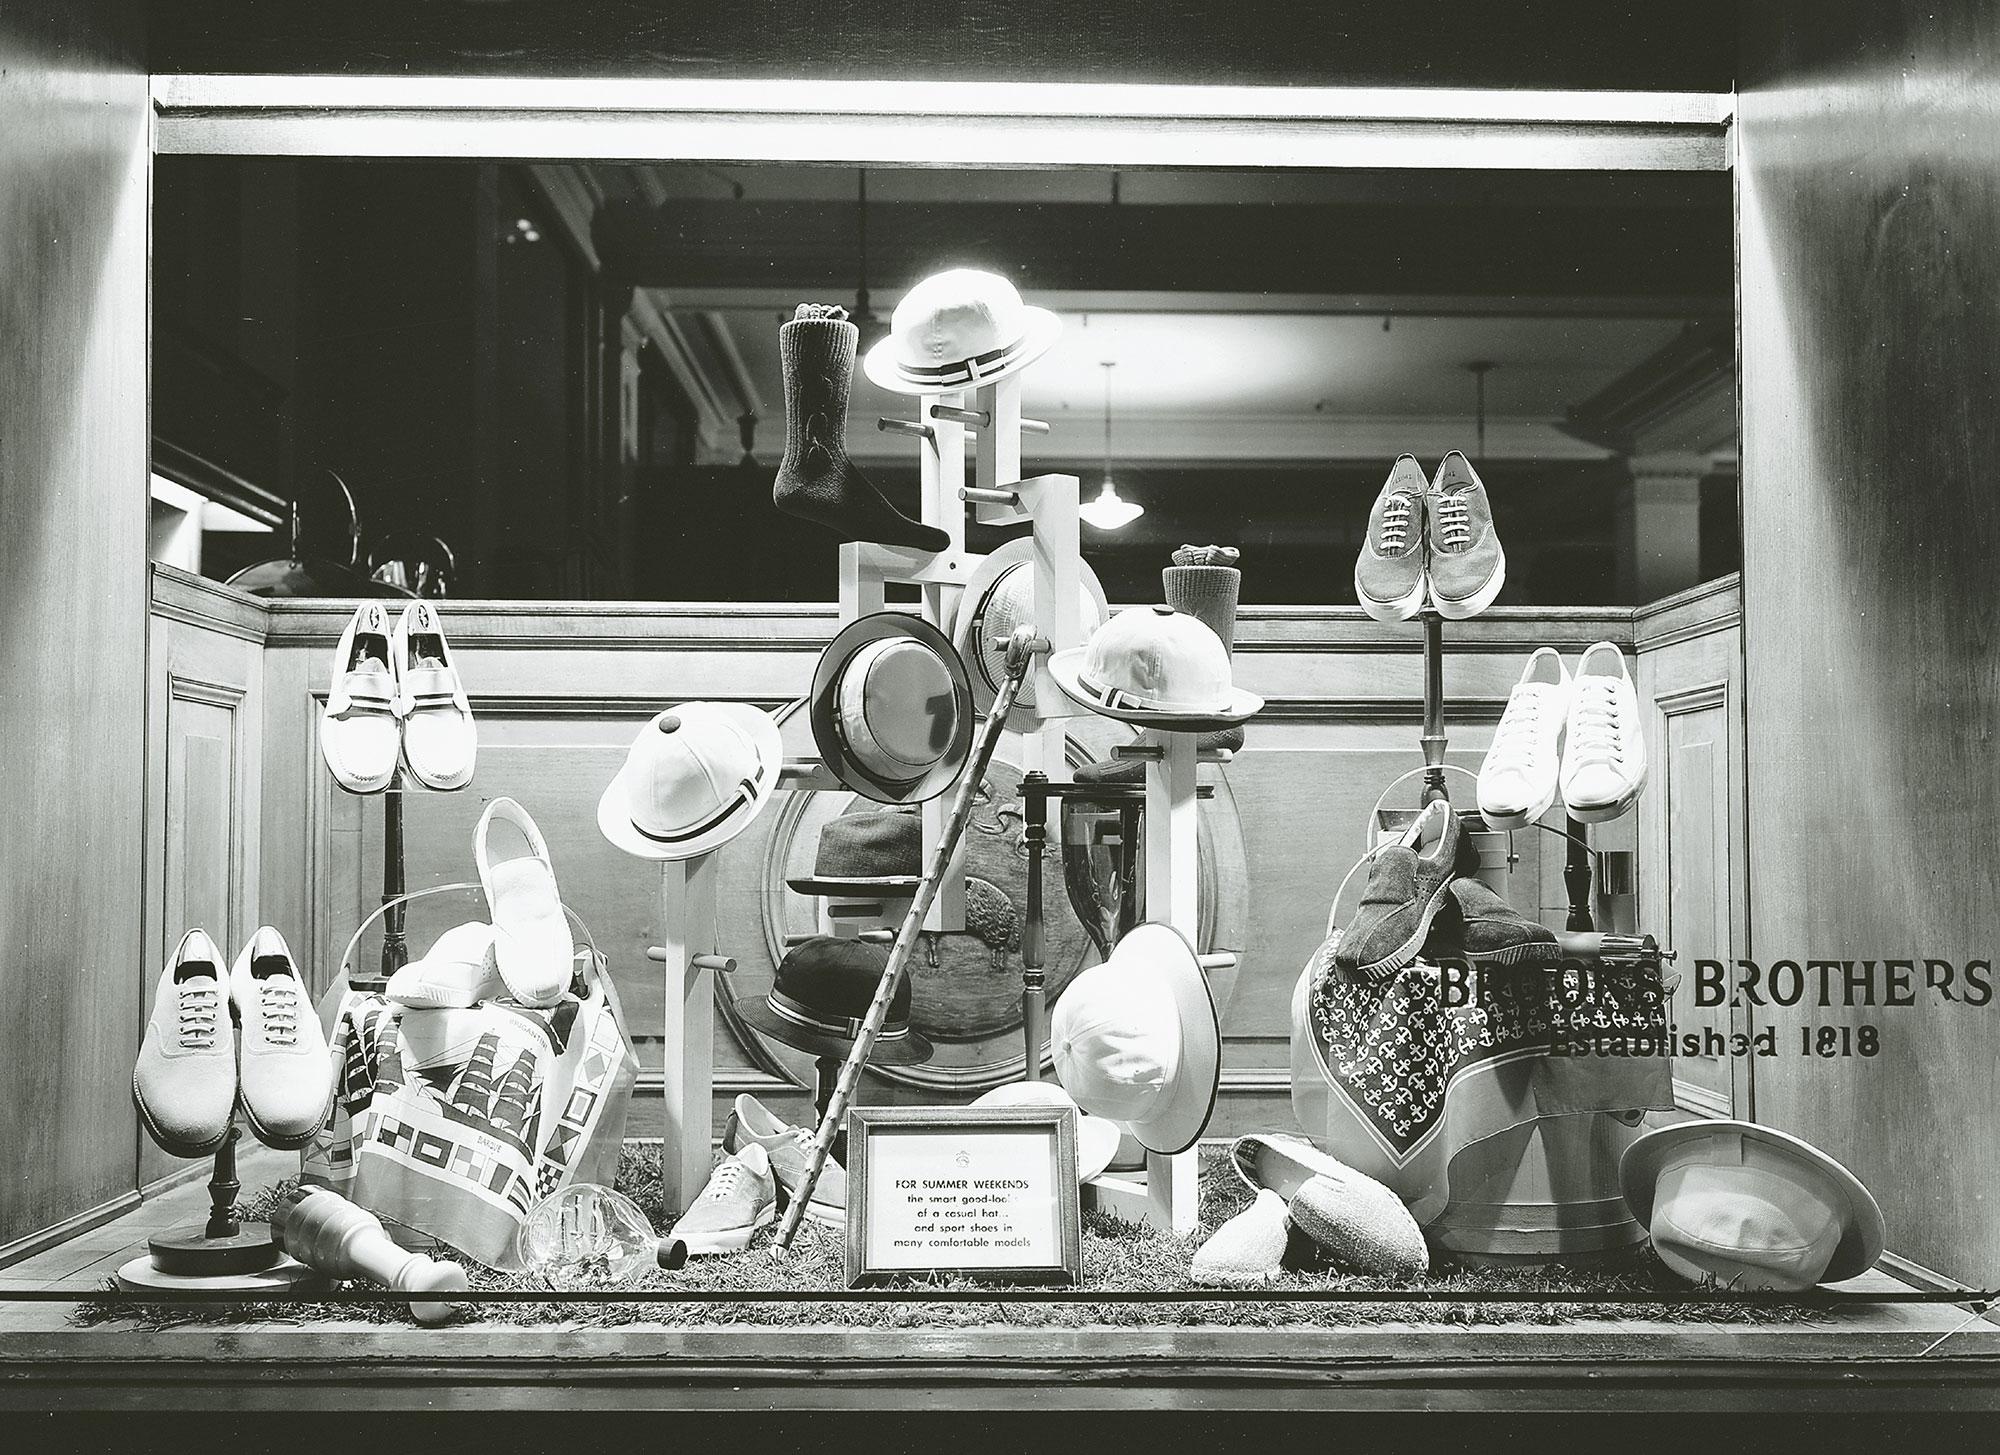 P108-109 : 1950年代のウィンドウ・ディスプレイ | © BROOKS BROTHERS: 200 Years of American Style